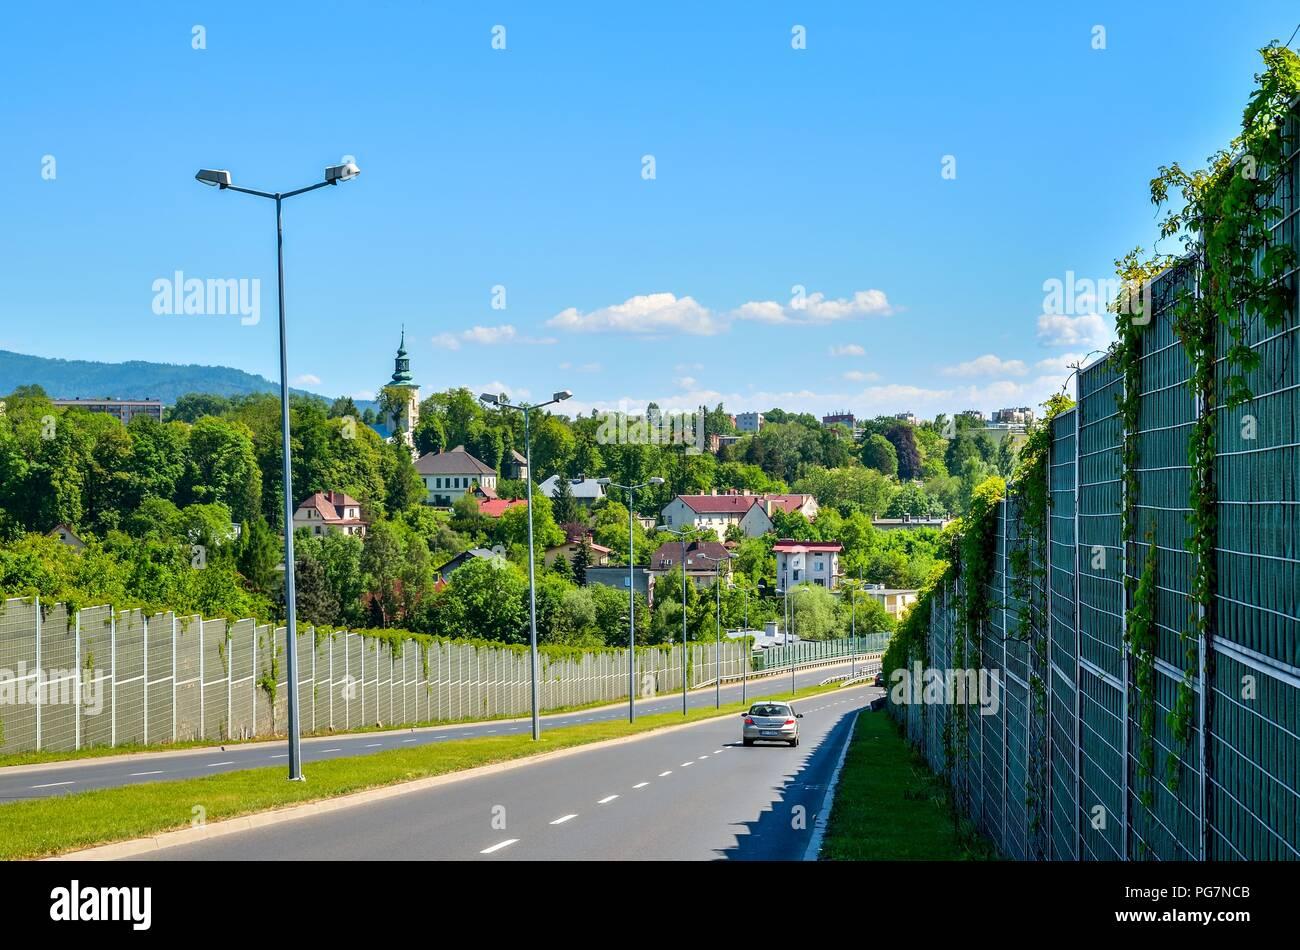 BIELSKO-BIALA, POLAND - MAY 13, 2018: View of the city of Bielsko-Biala in Poland. - Stock Image